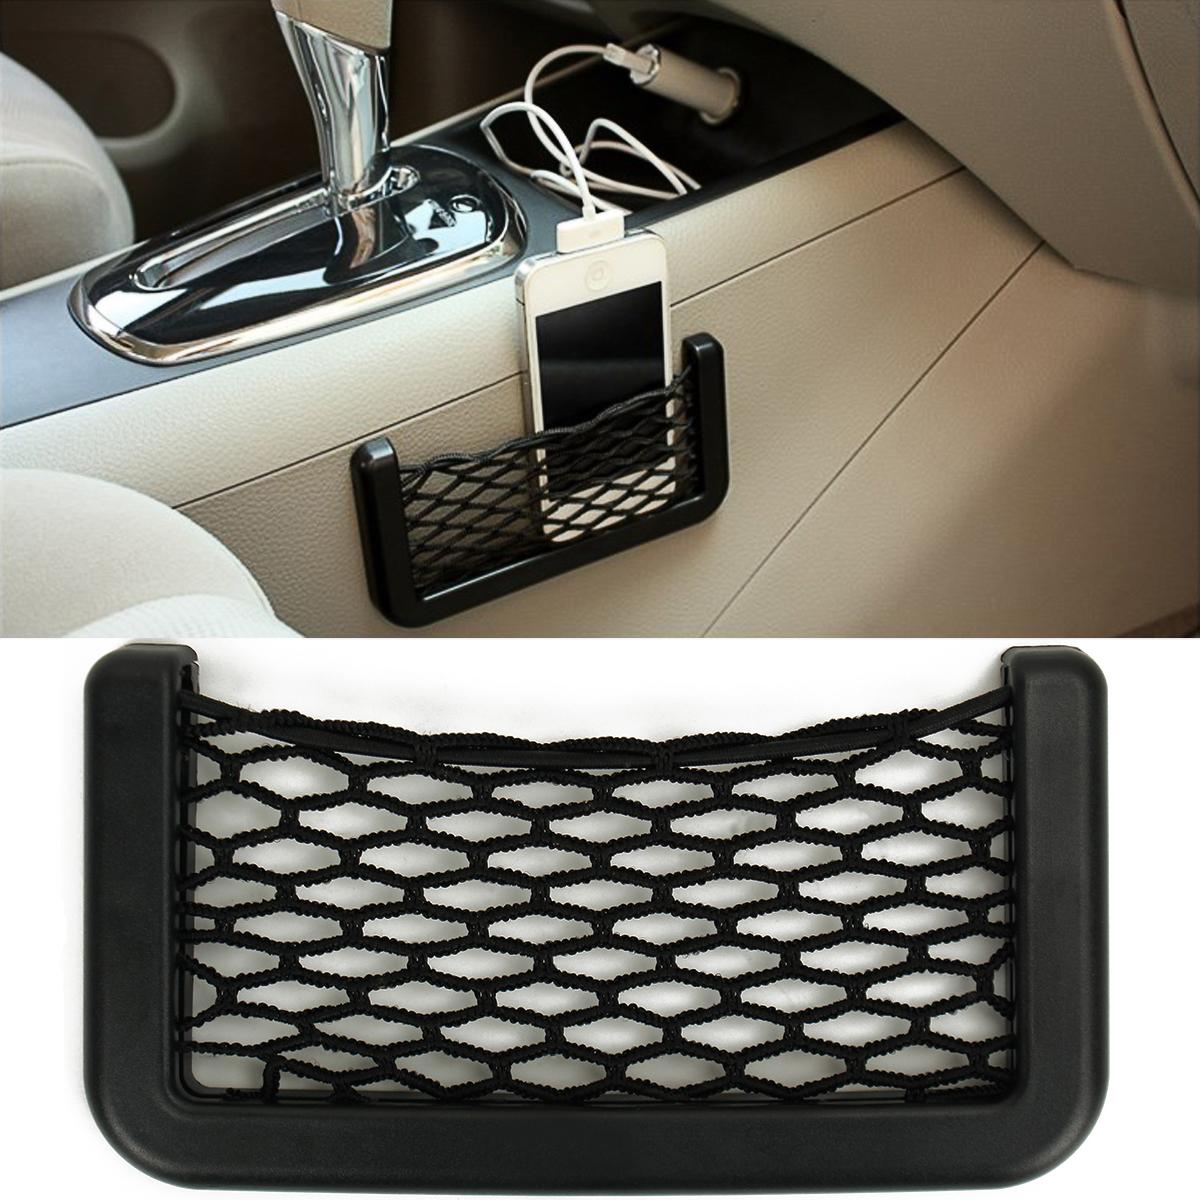 Fit for BMW Benz Car interior Accessories Practical Car Organizer Bag Storage 1X